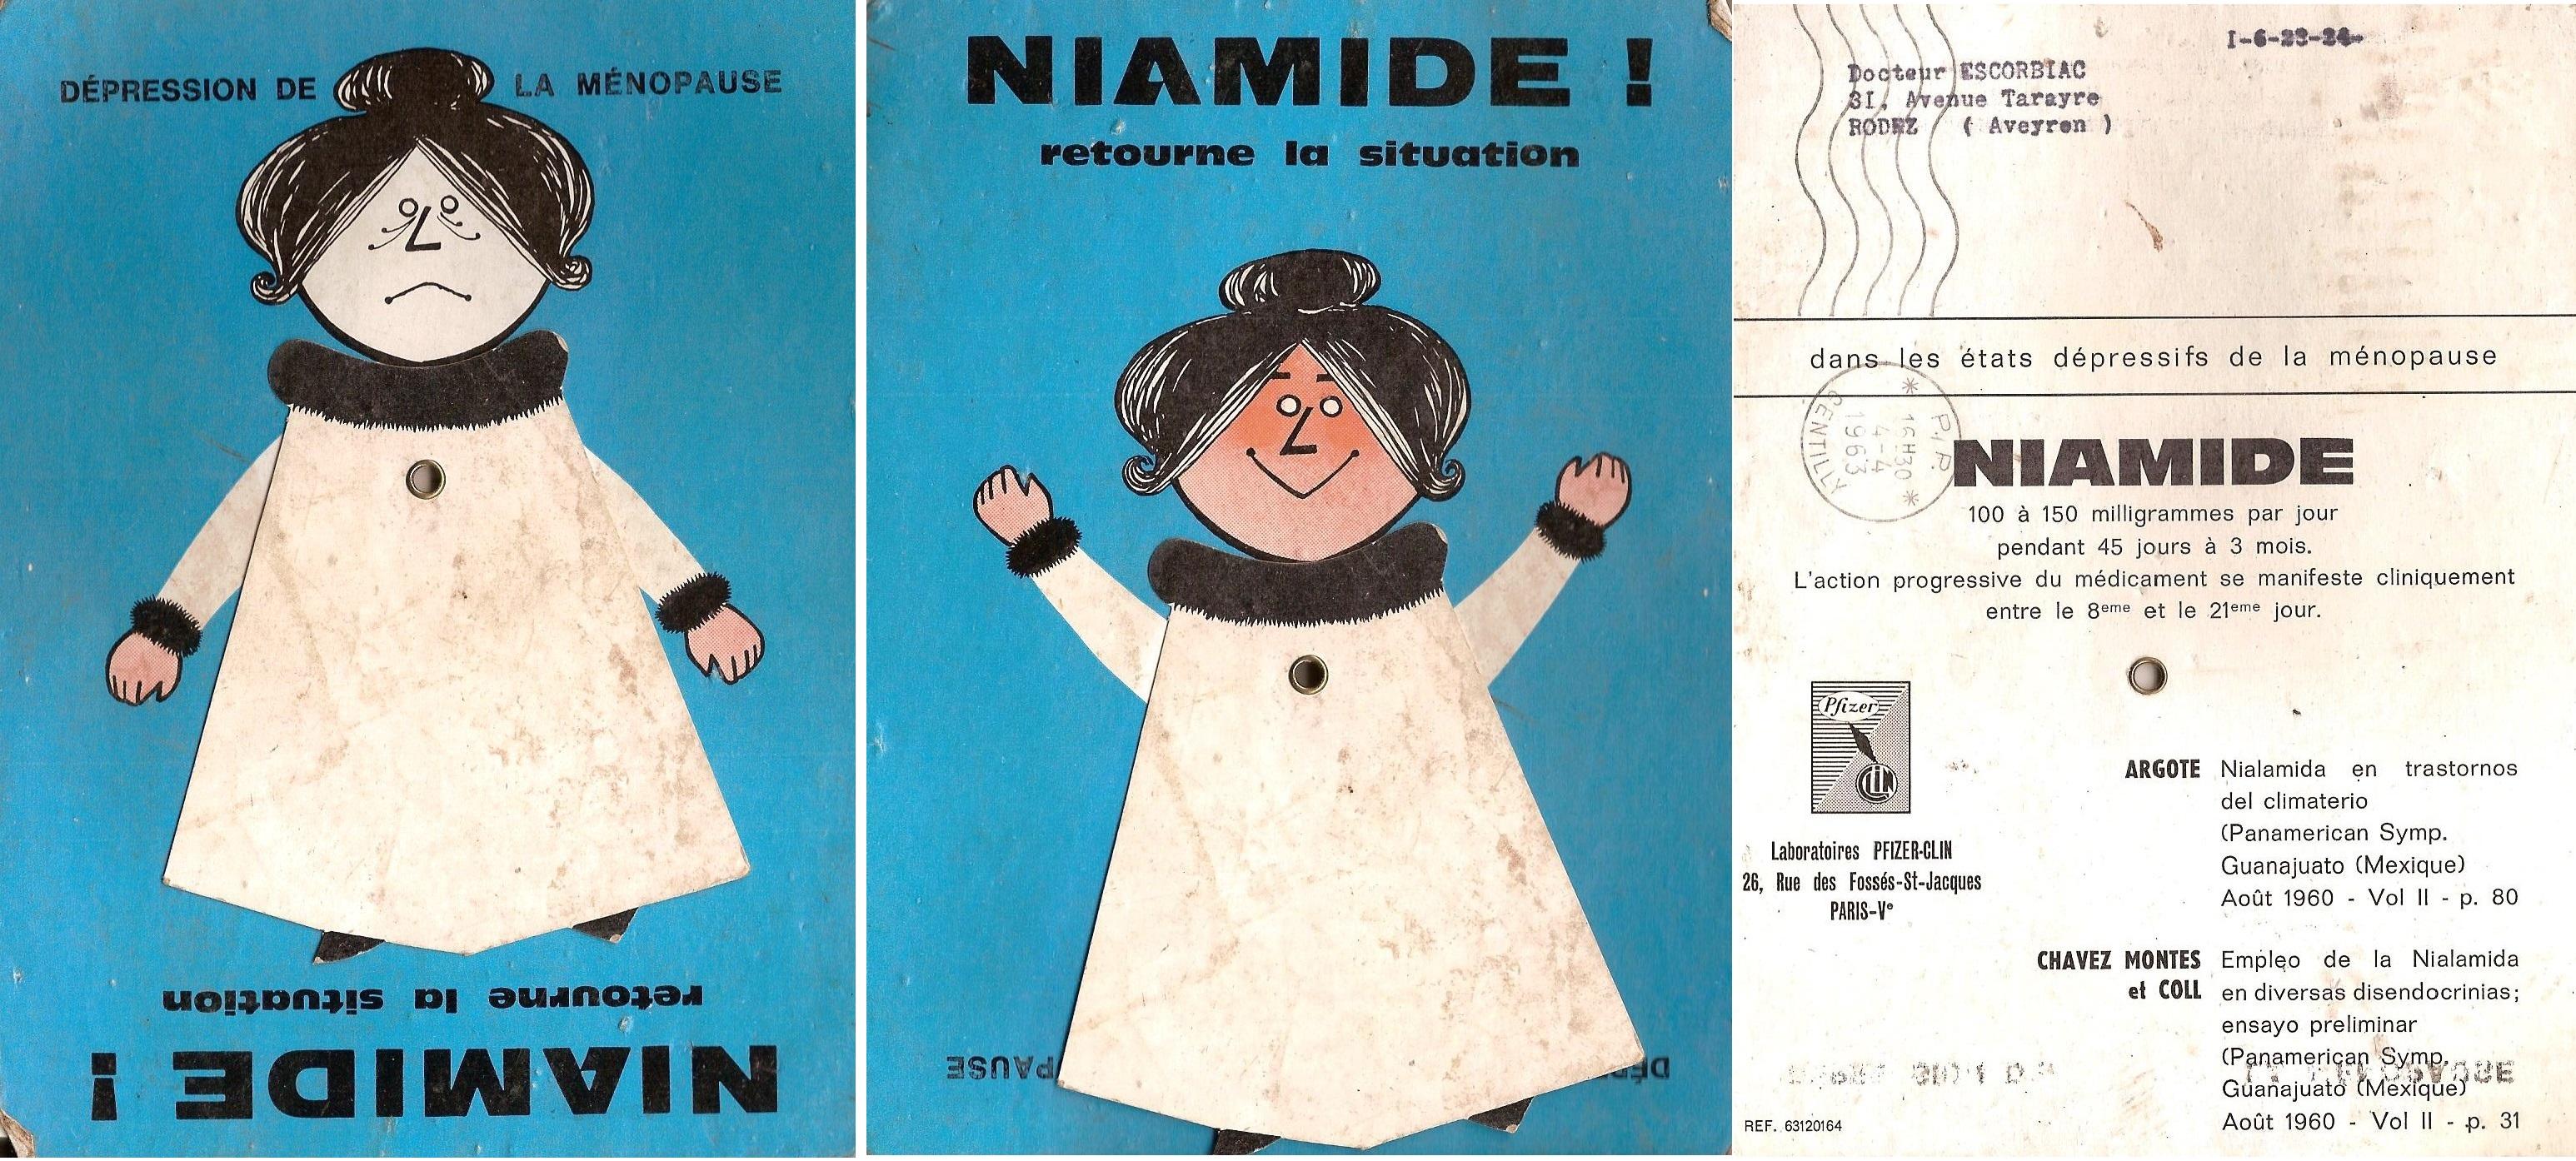 1961 Niamide